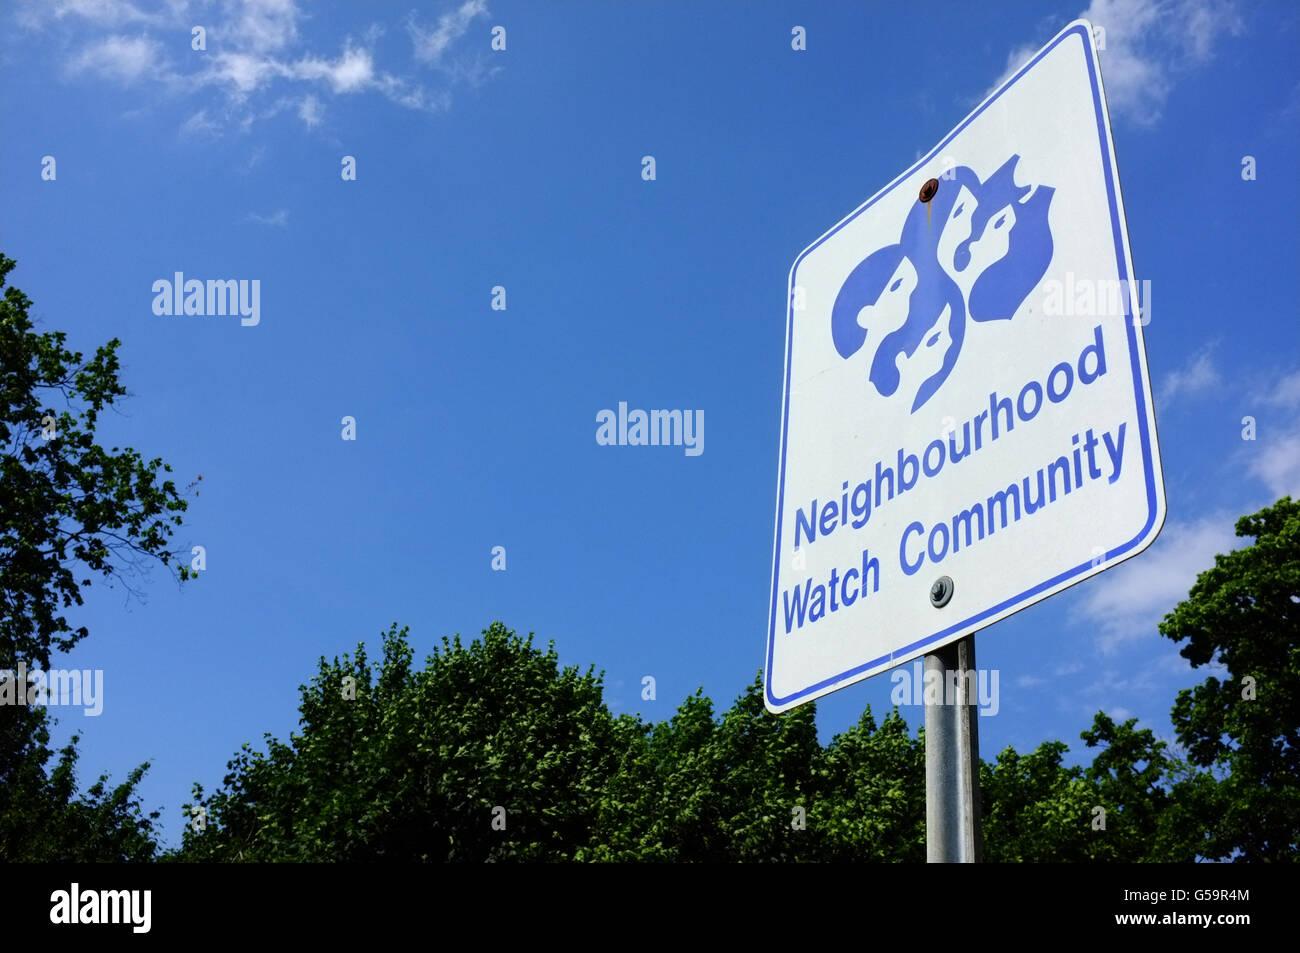 A Neighbourhood Watch Community sign in London, Ontario. - Stock Image